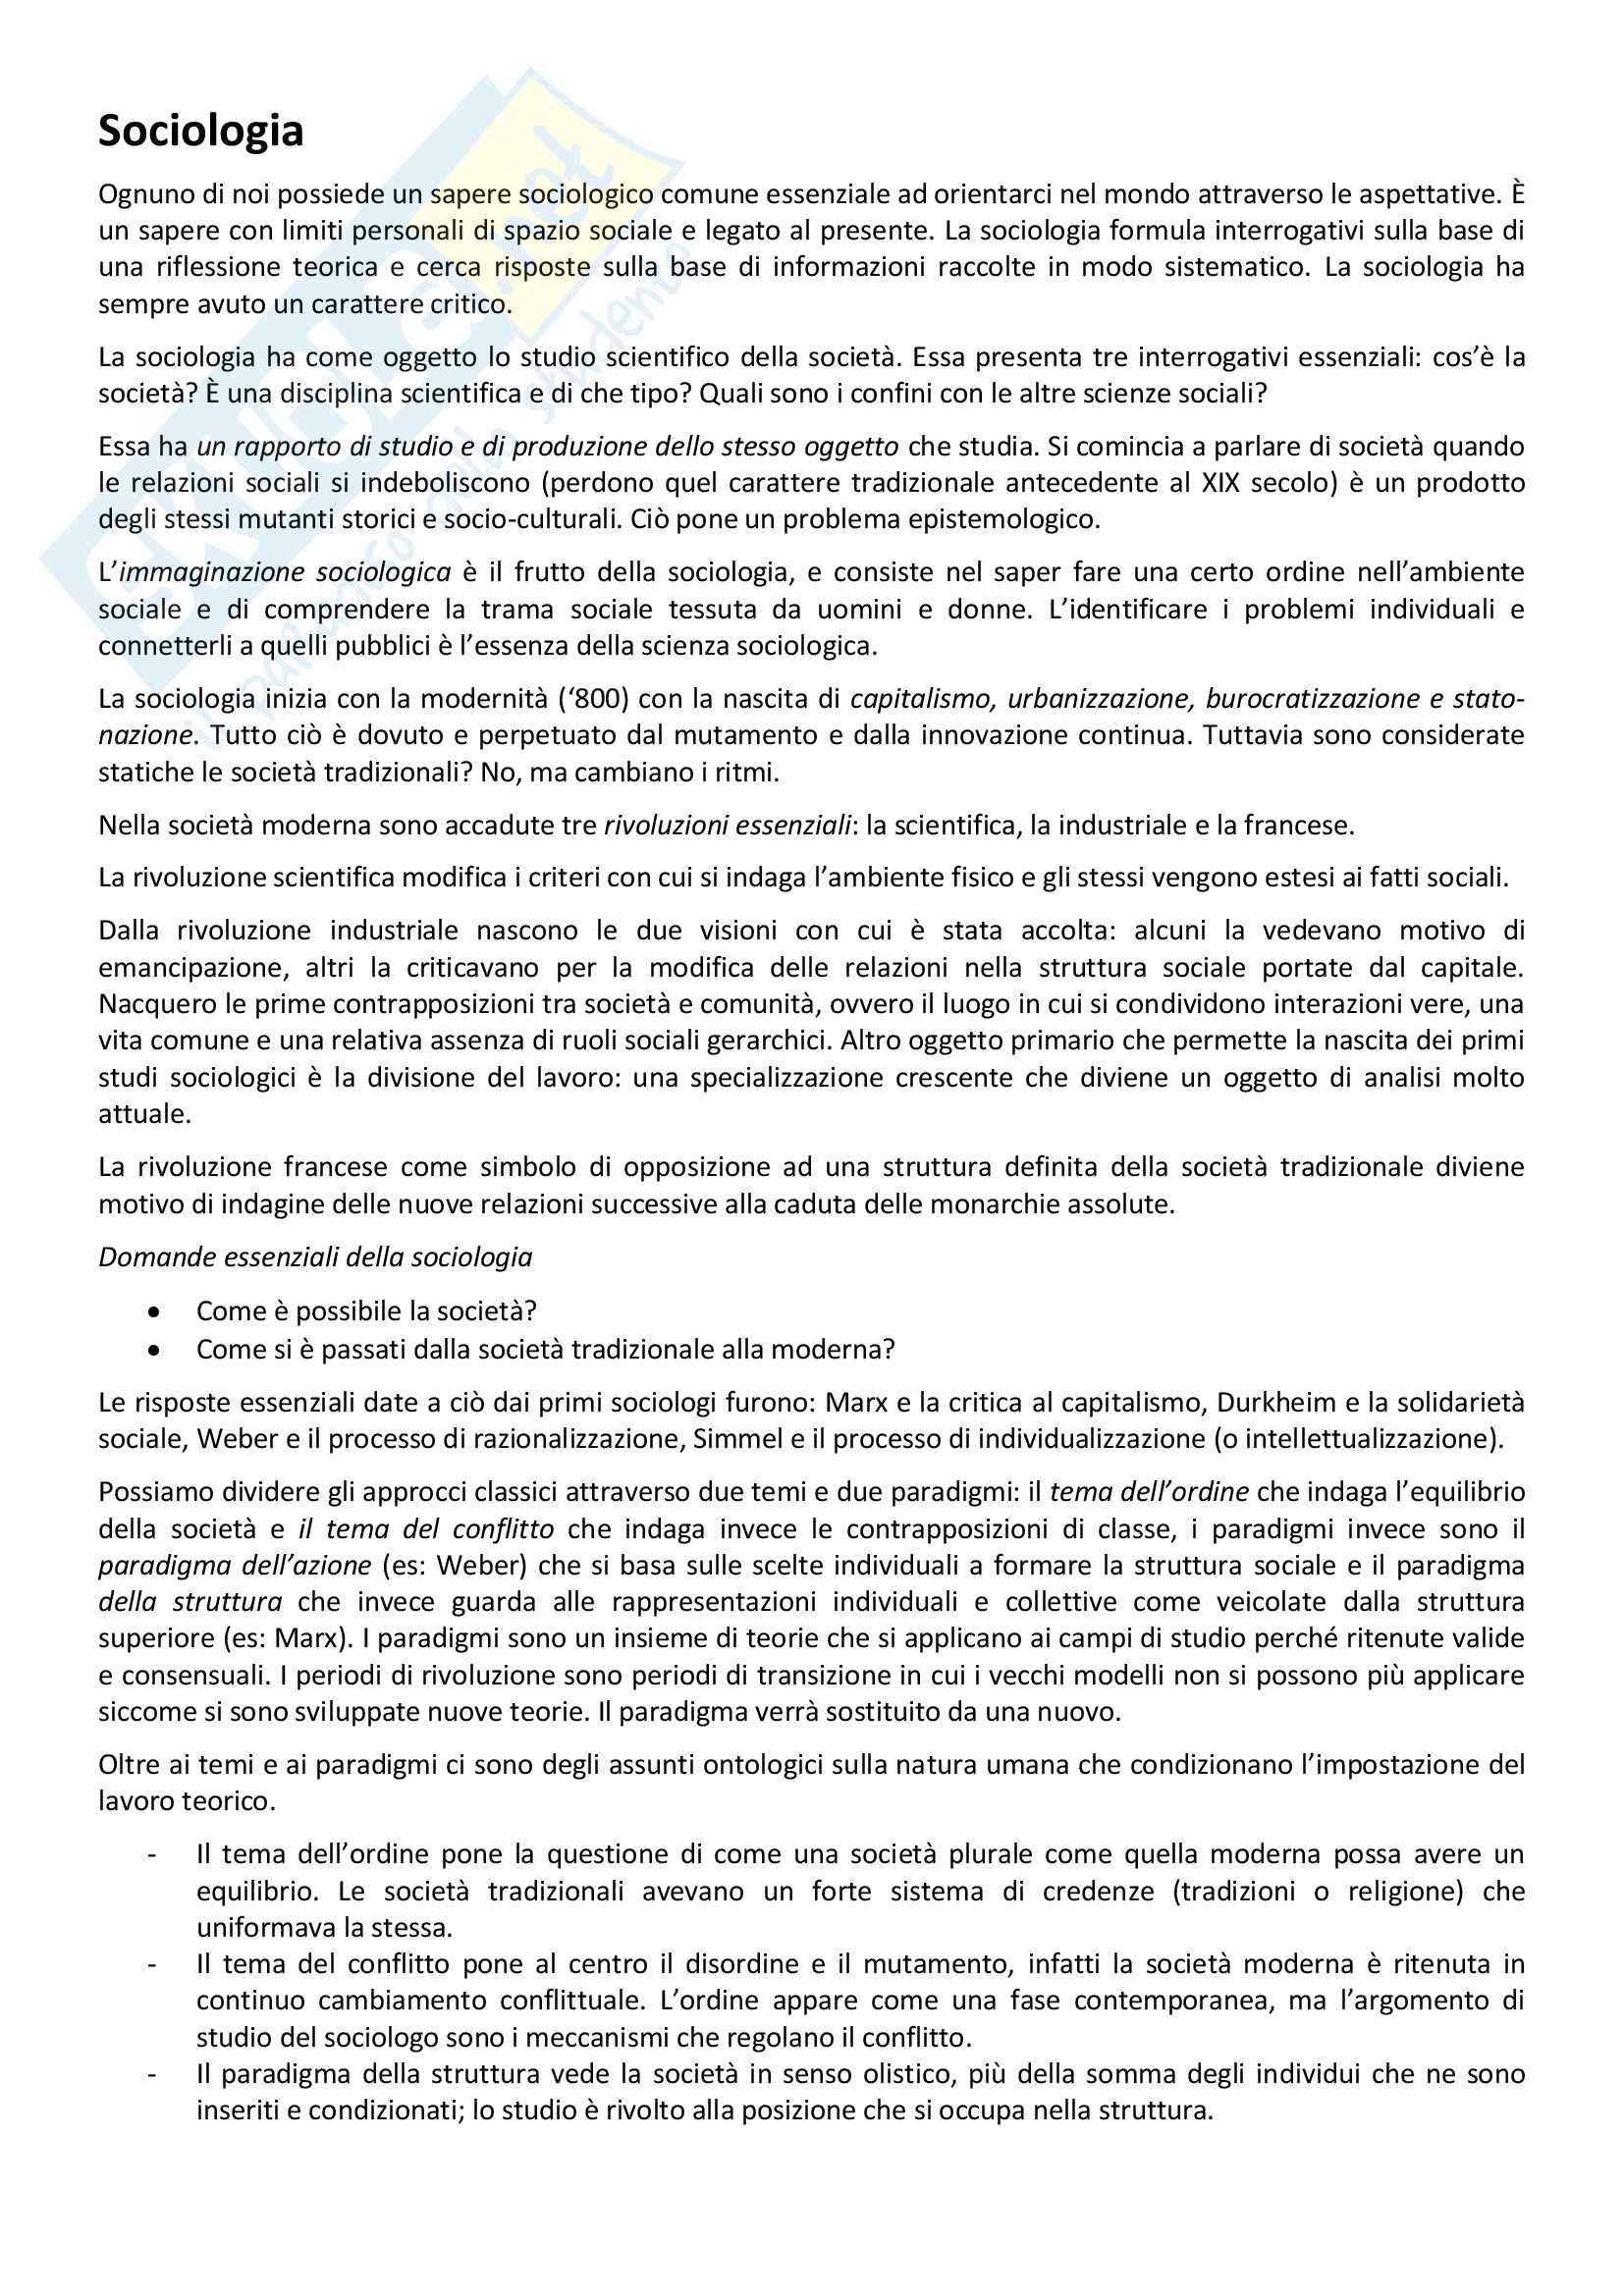 Appunto Sociologia, prof. Marchisio